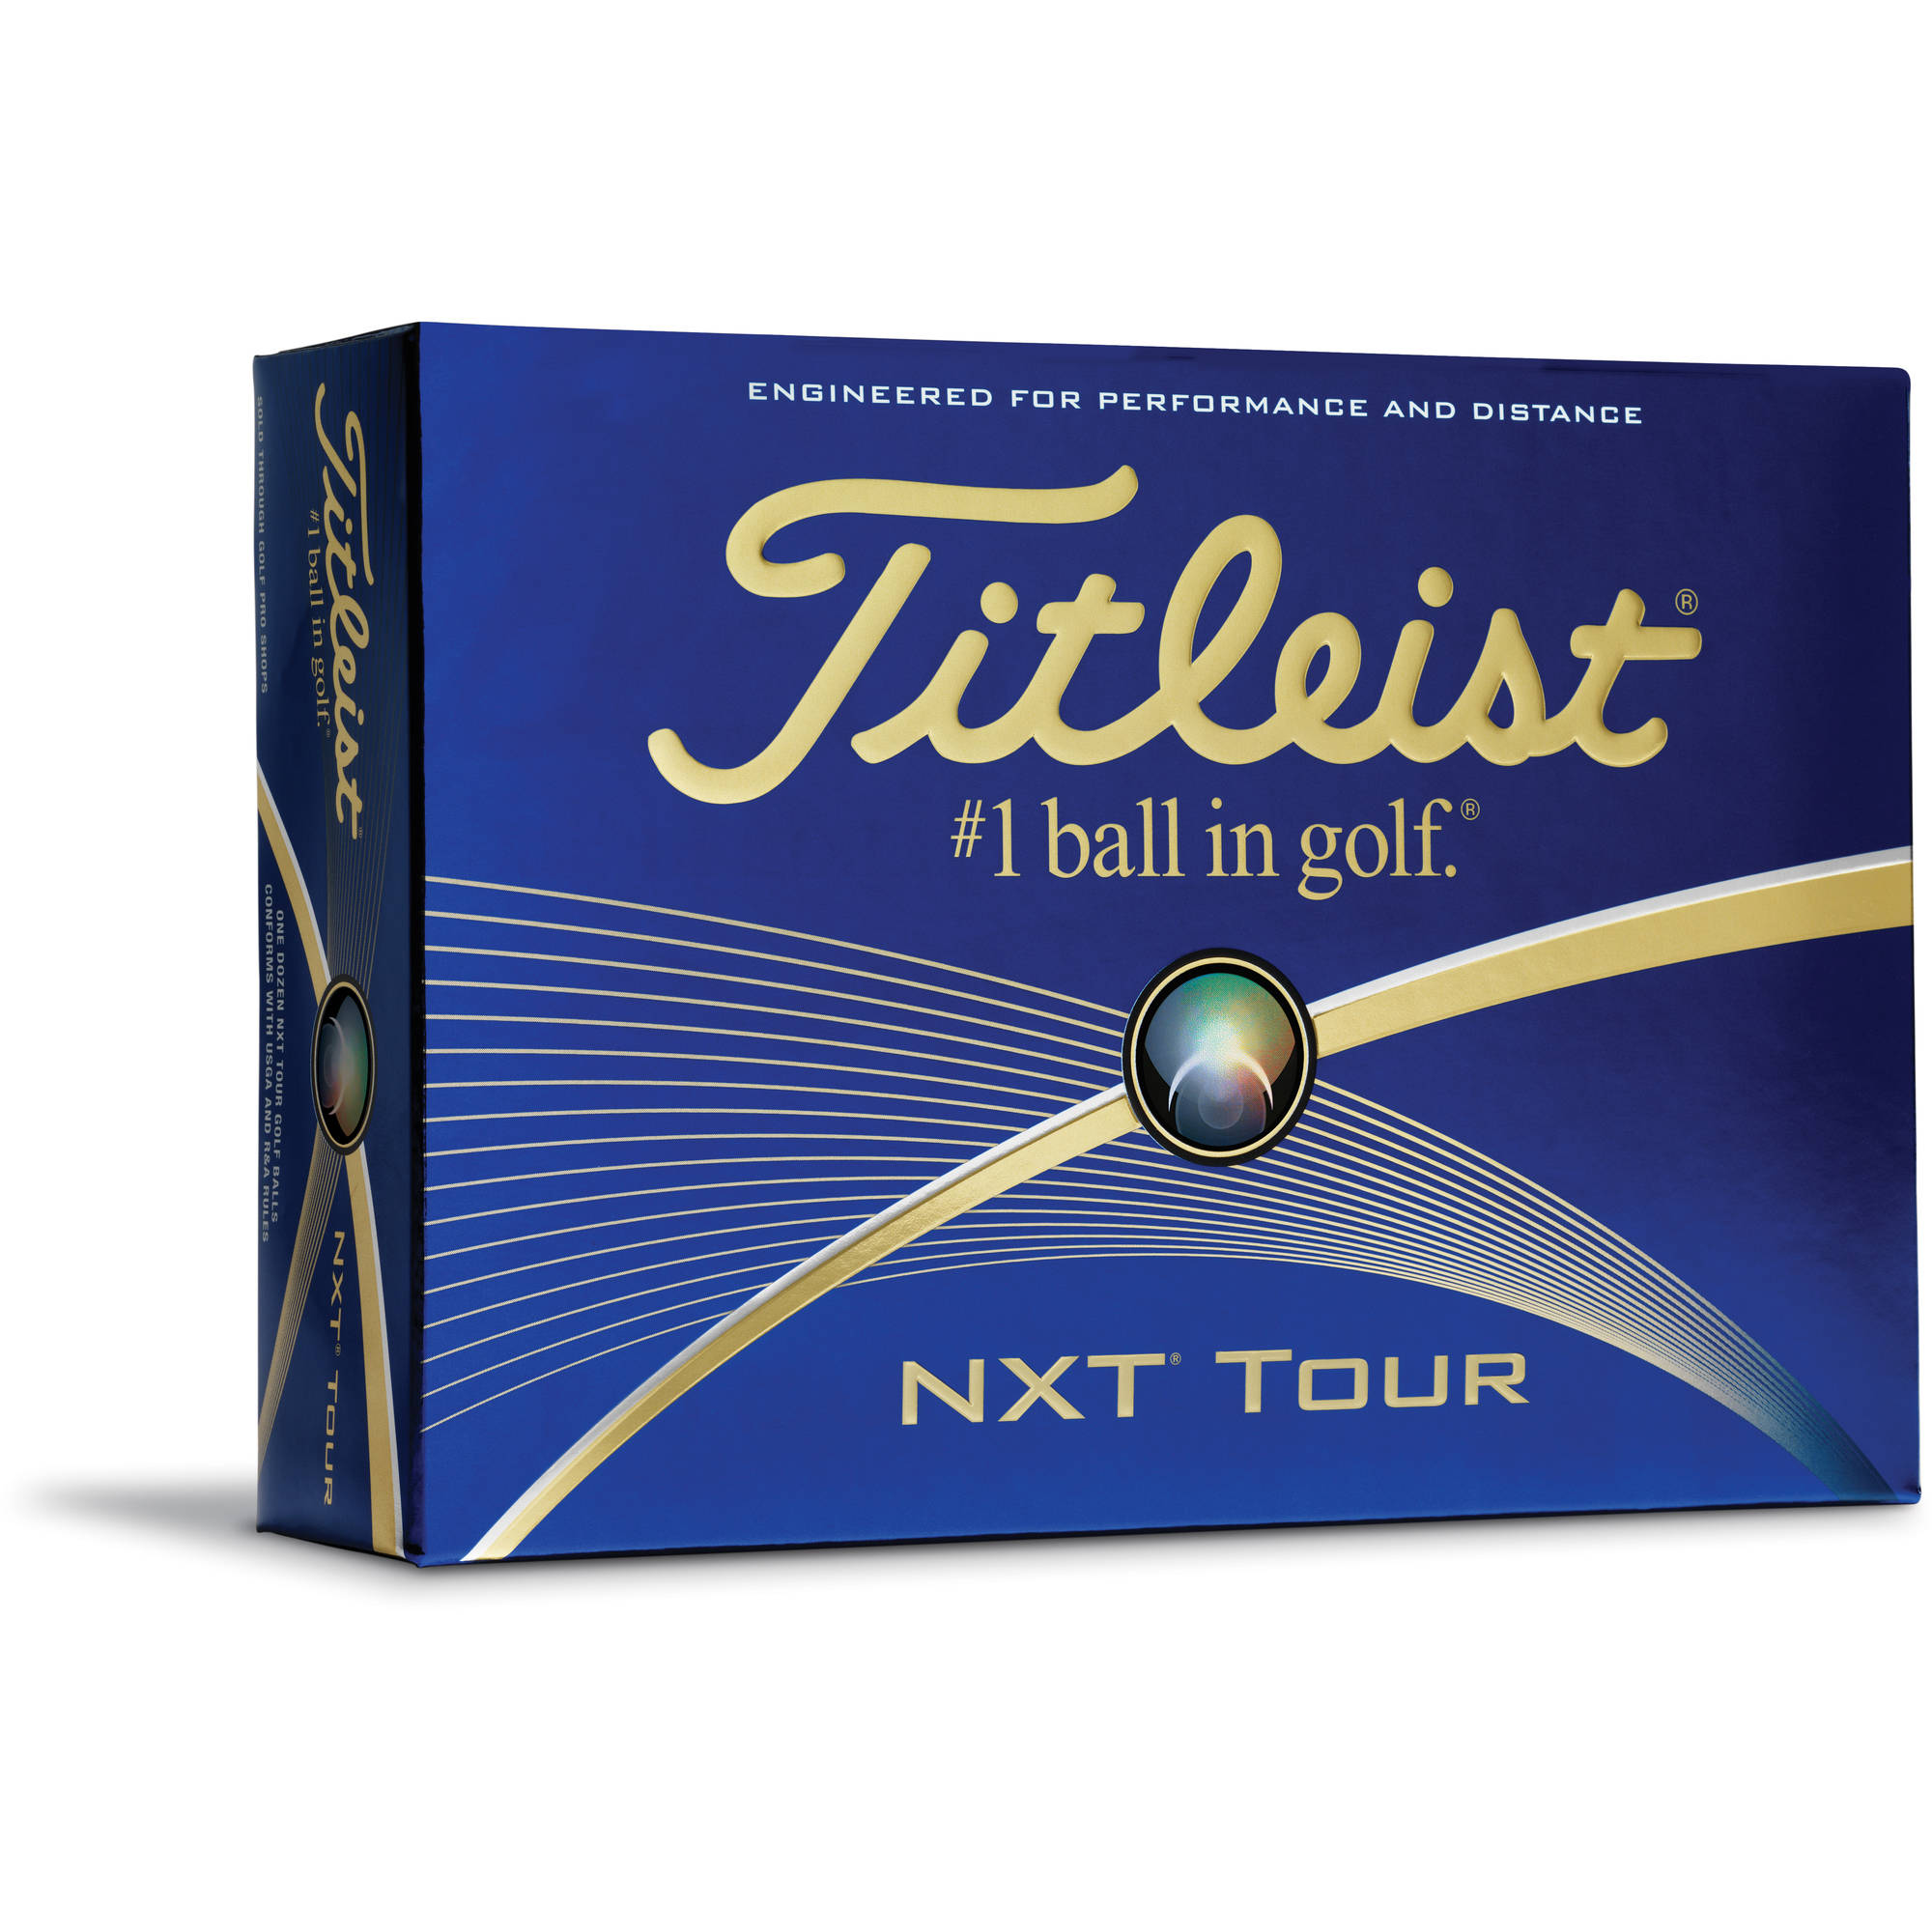 Titleist NXT Tour Golf Balls by Acushnet Company